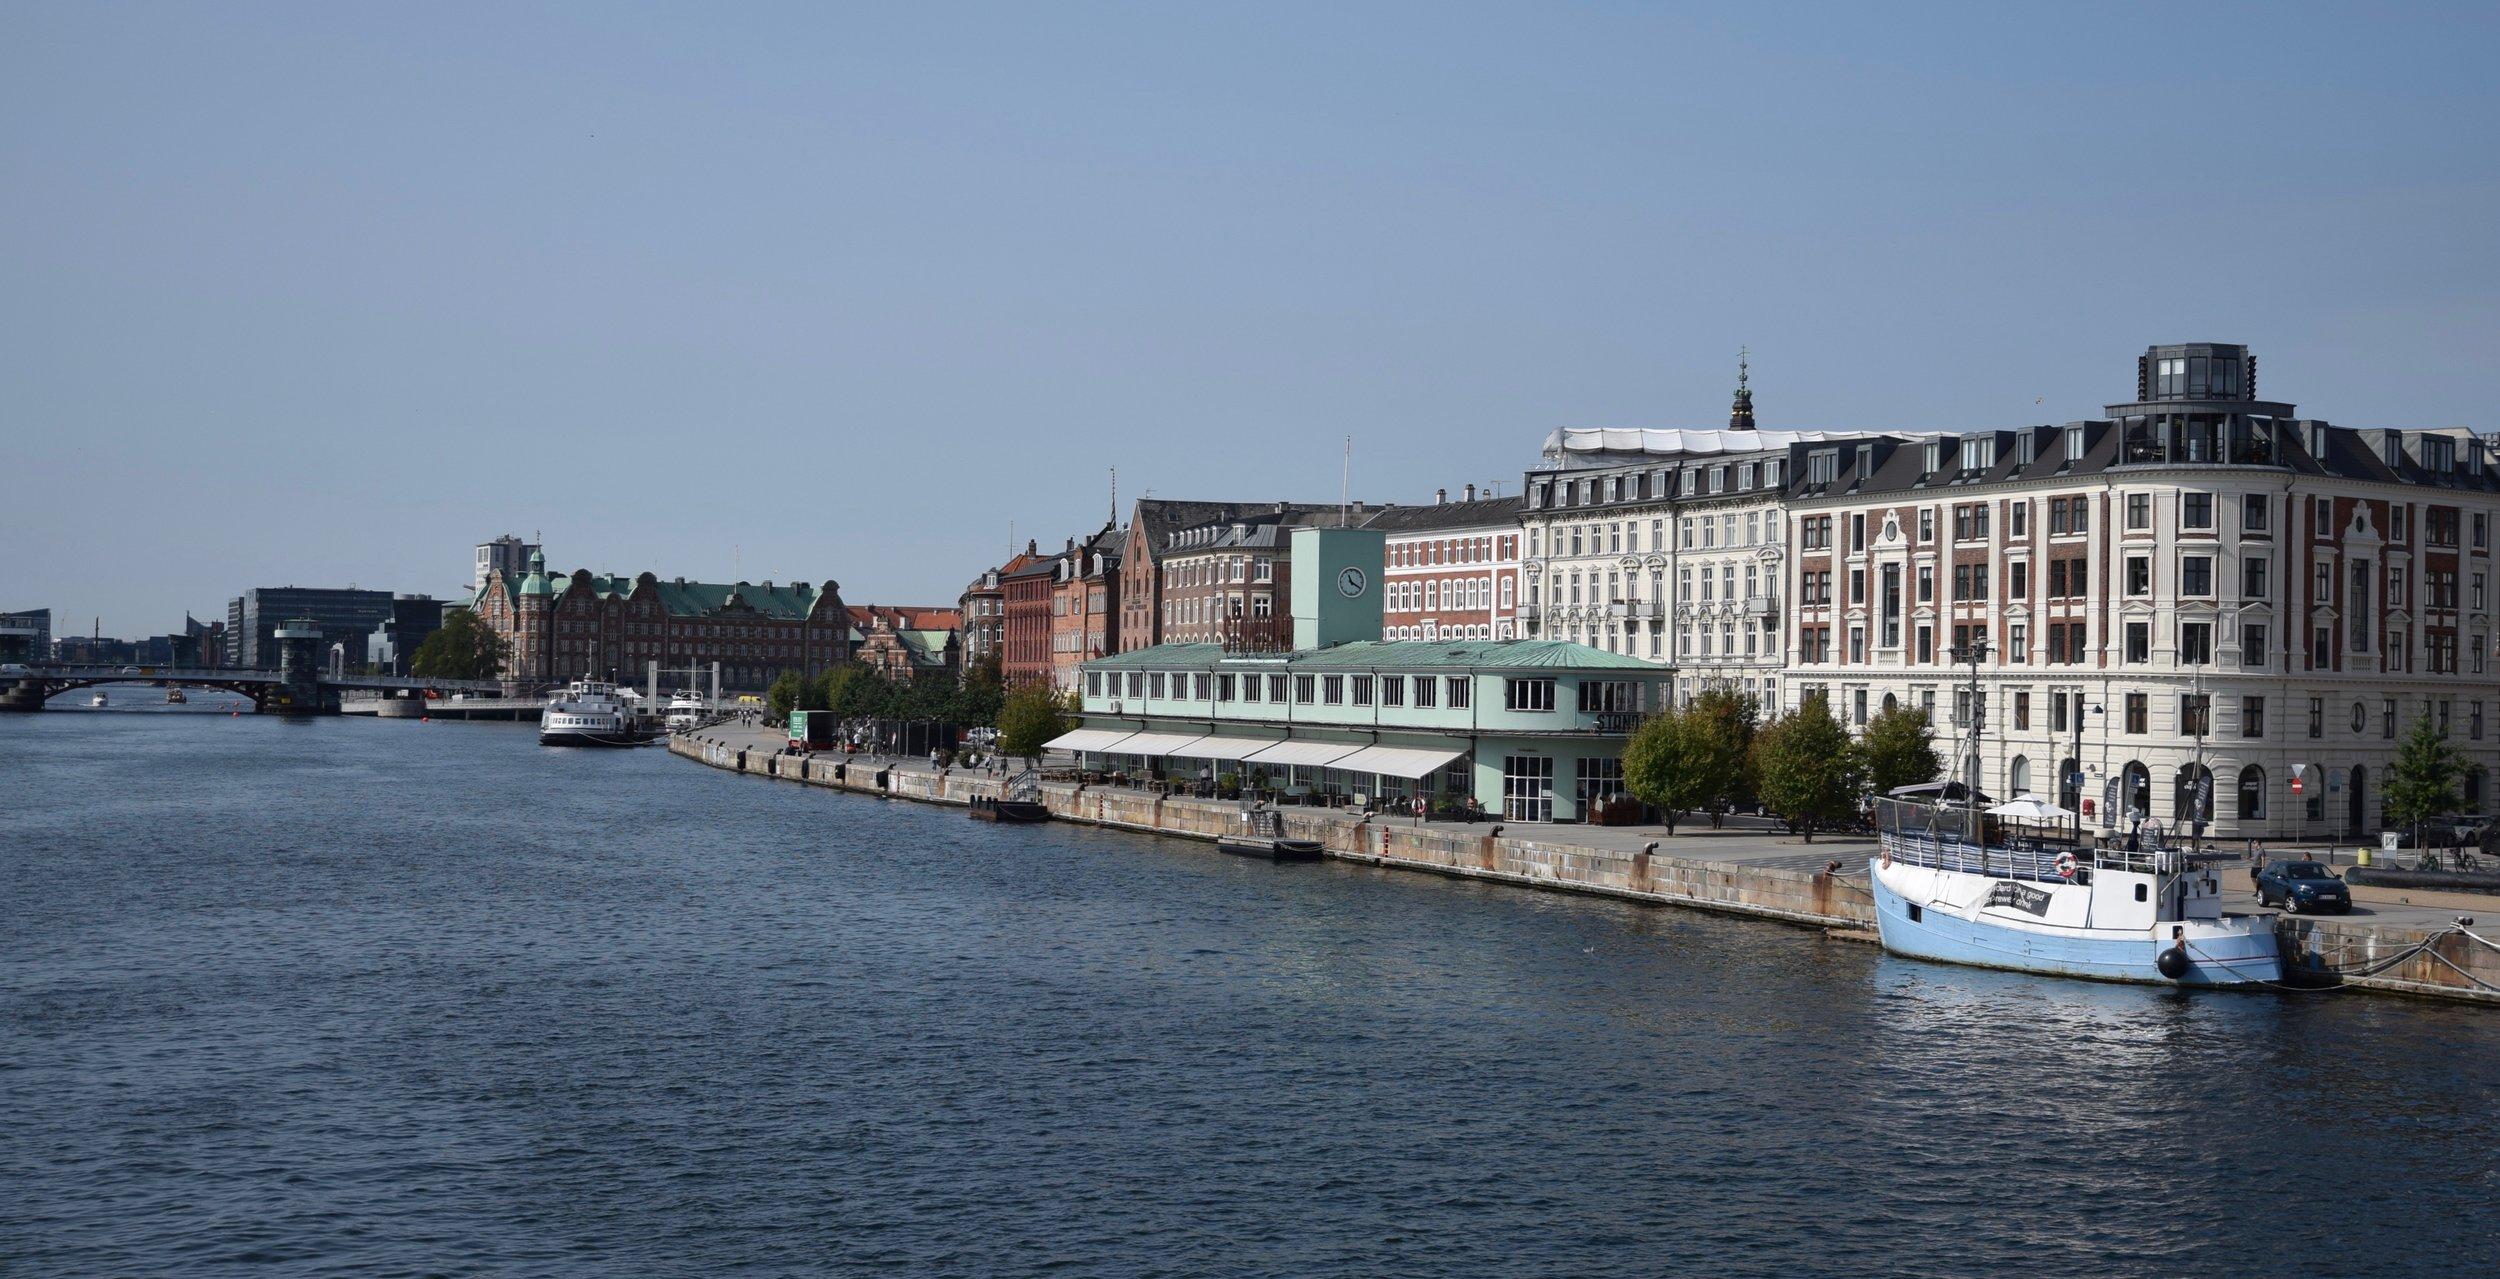 View North: Nyhavn (New Harbour)